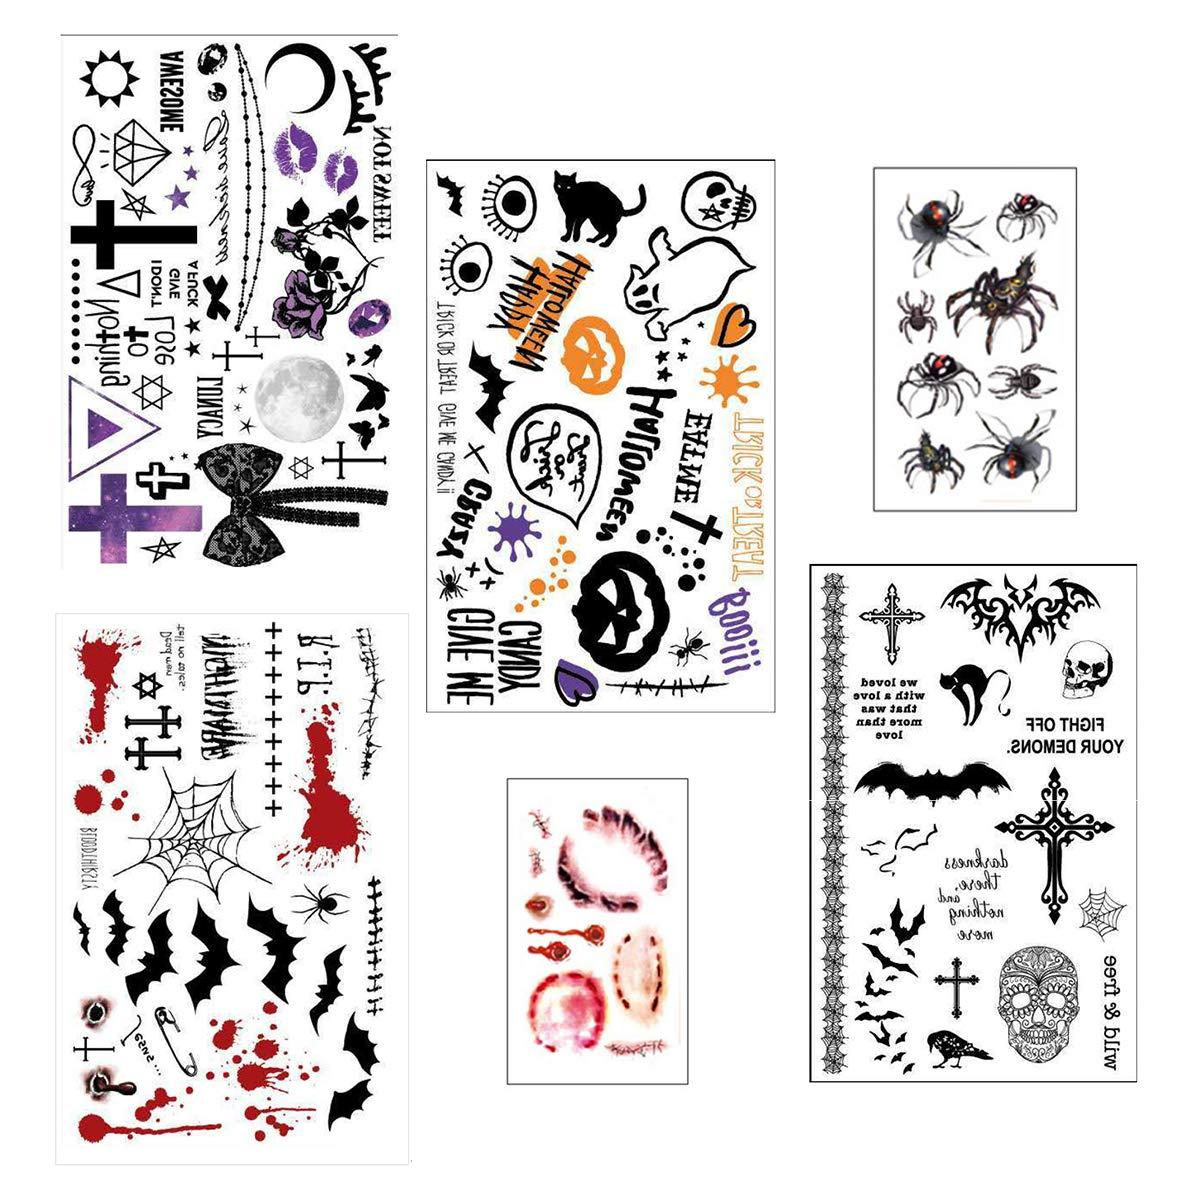 6 Sheets Halloween Temporary Tattoo Stickers For Women & Kids With Skull/Scar/Pumpkin/Cross Designs